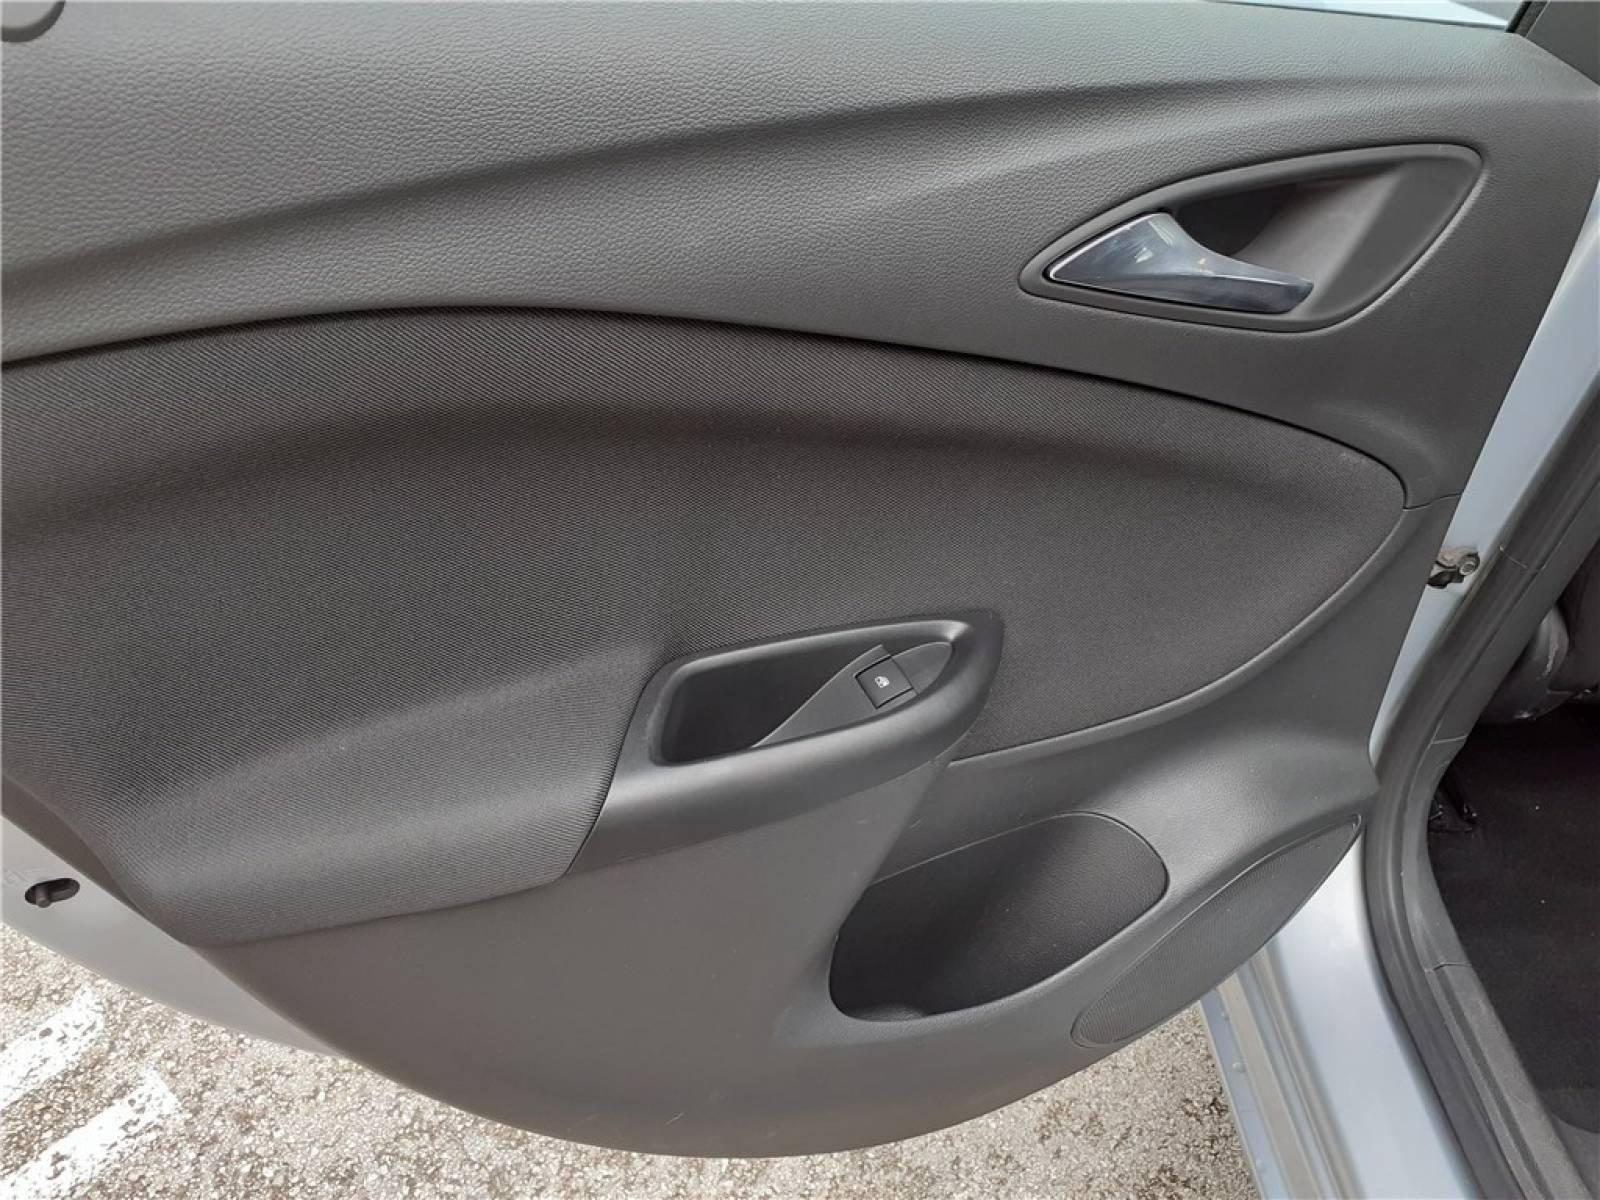 OPEL Astra Sports Tourer 1.6 CDTI 110 ch - véhicule d'occasion - Groupe Guillet - Opel Magicauto - Chalon-sur-Saône - 71380 - Saint-Marcel - 25